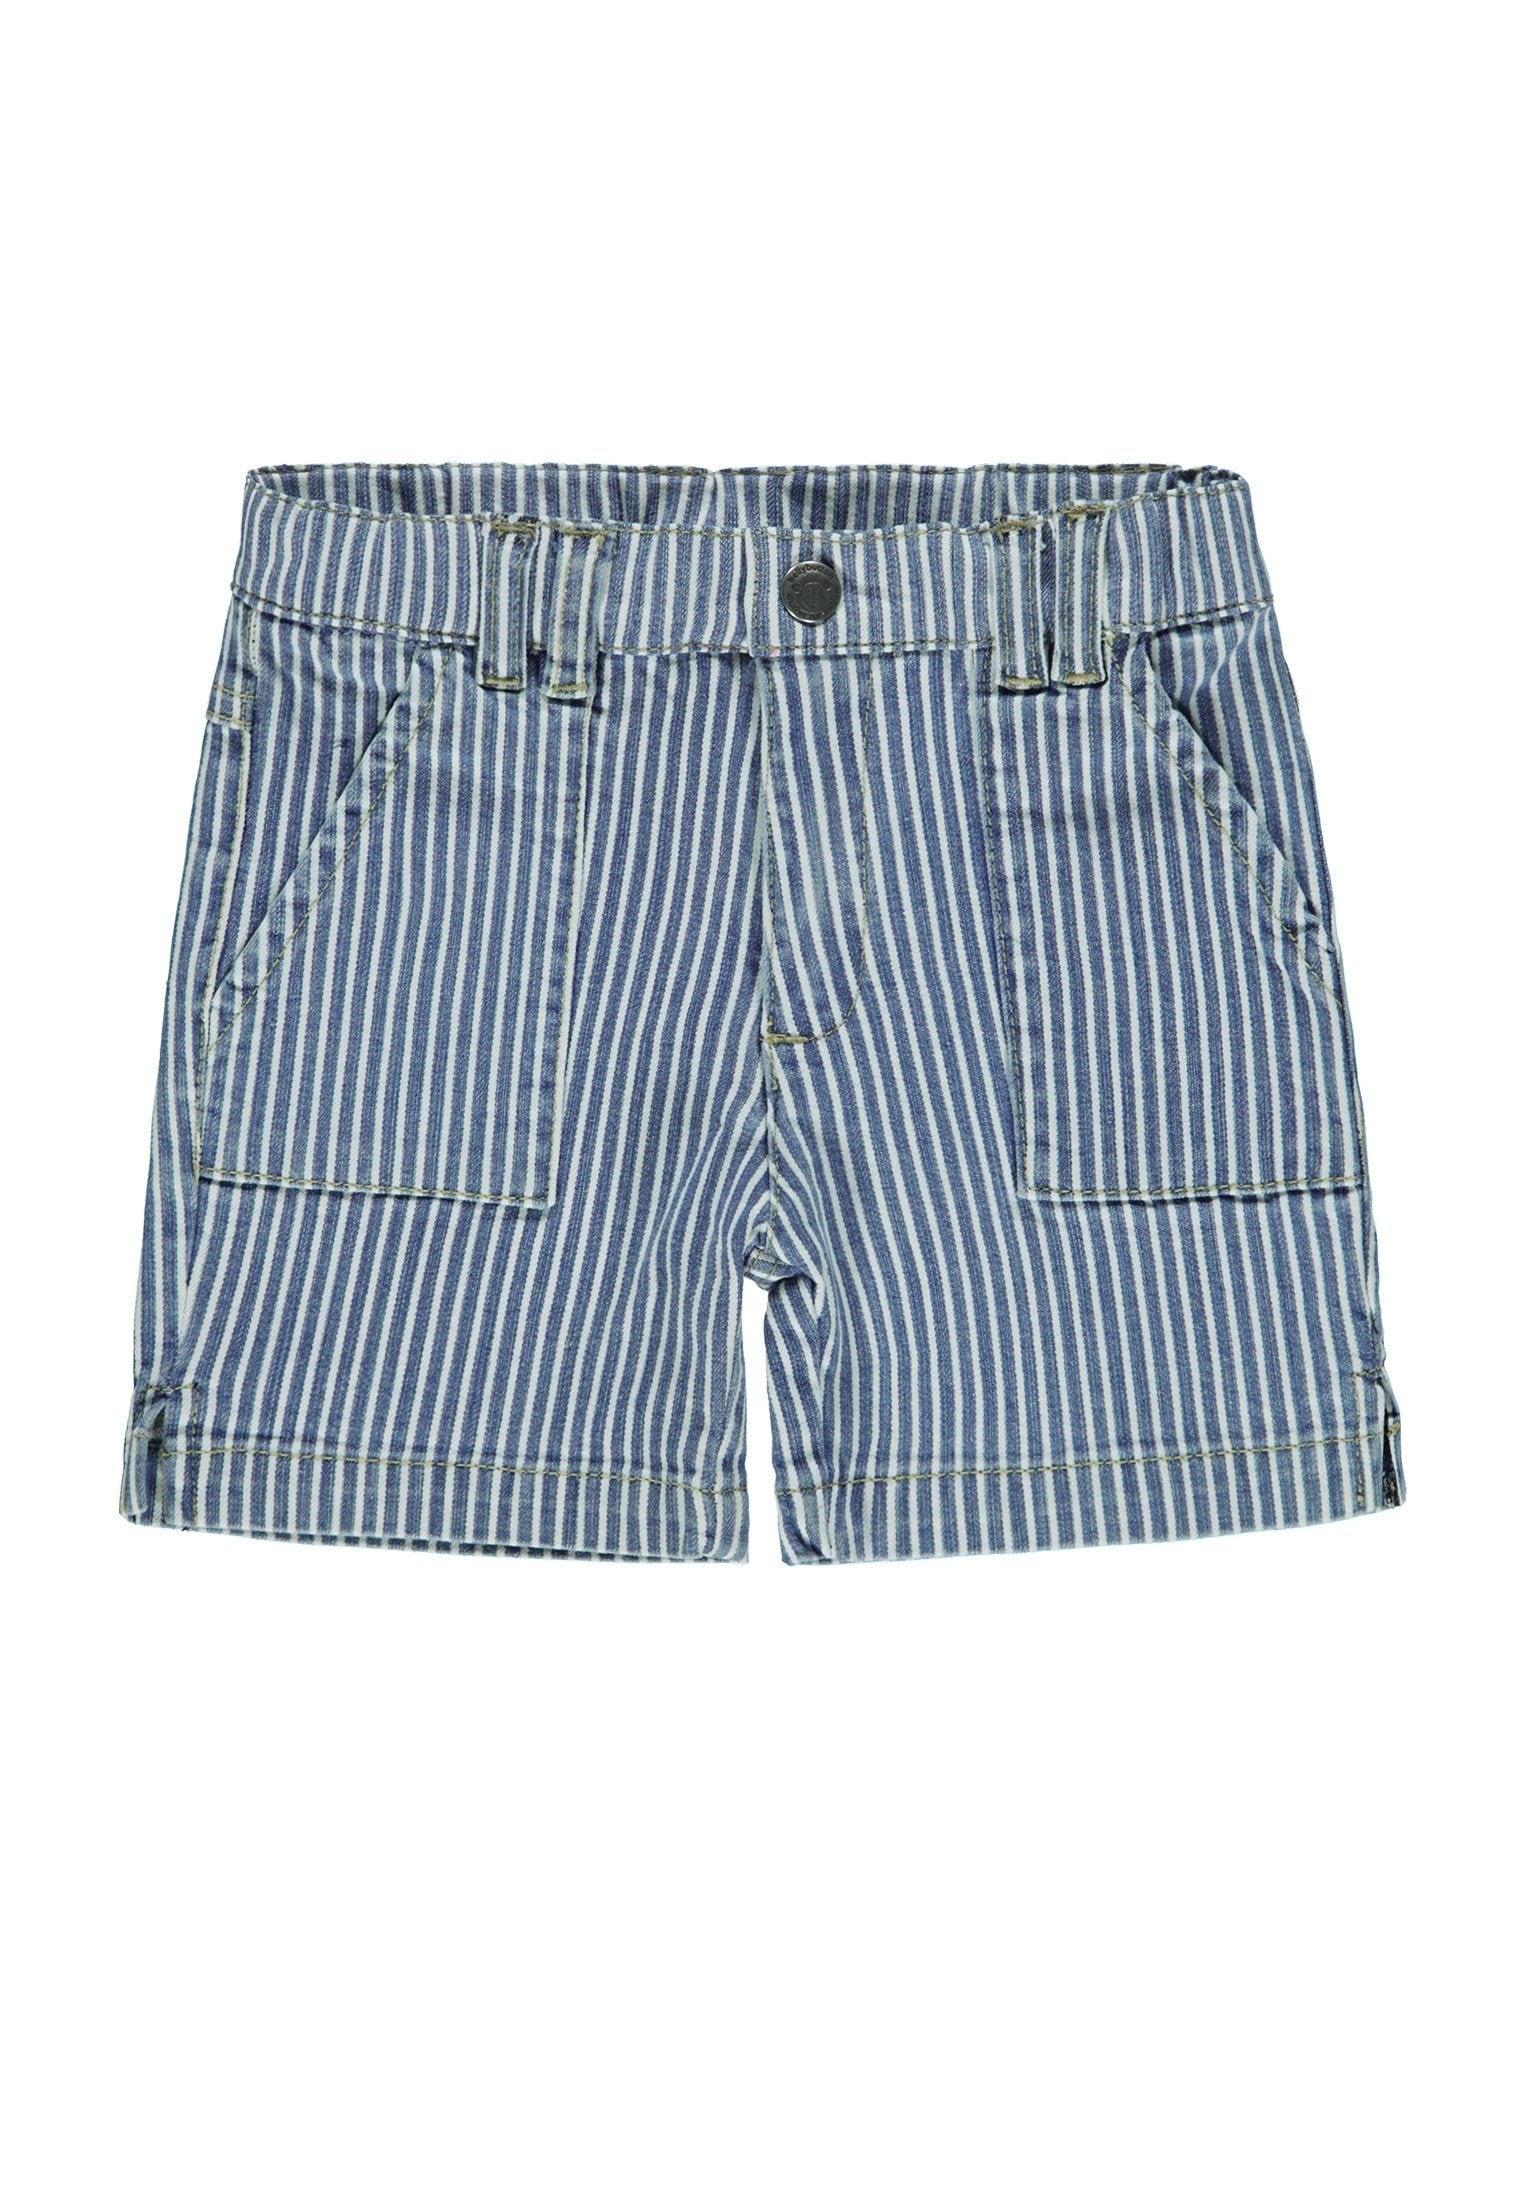 Image of Bellybutton Bermudas, Jeans, gestreift